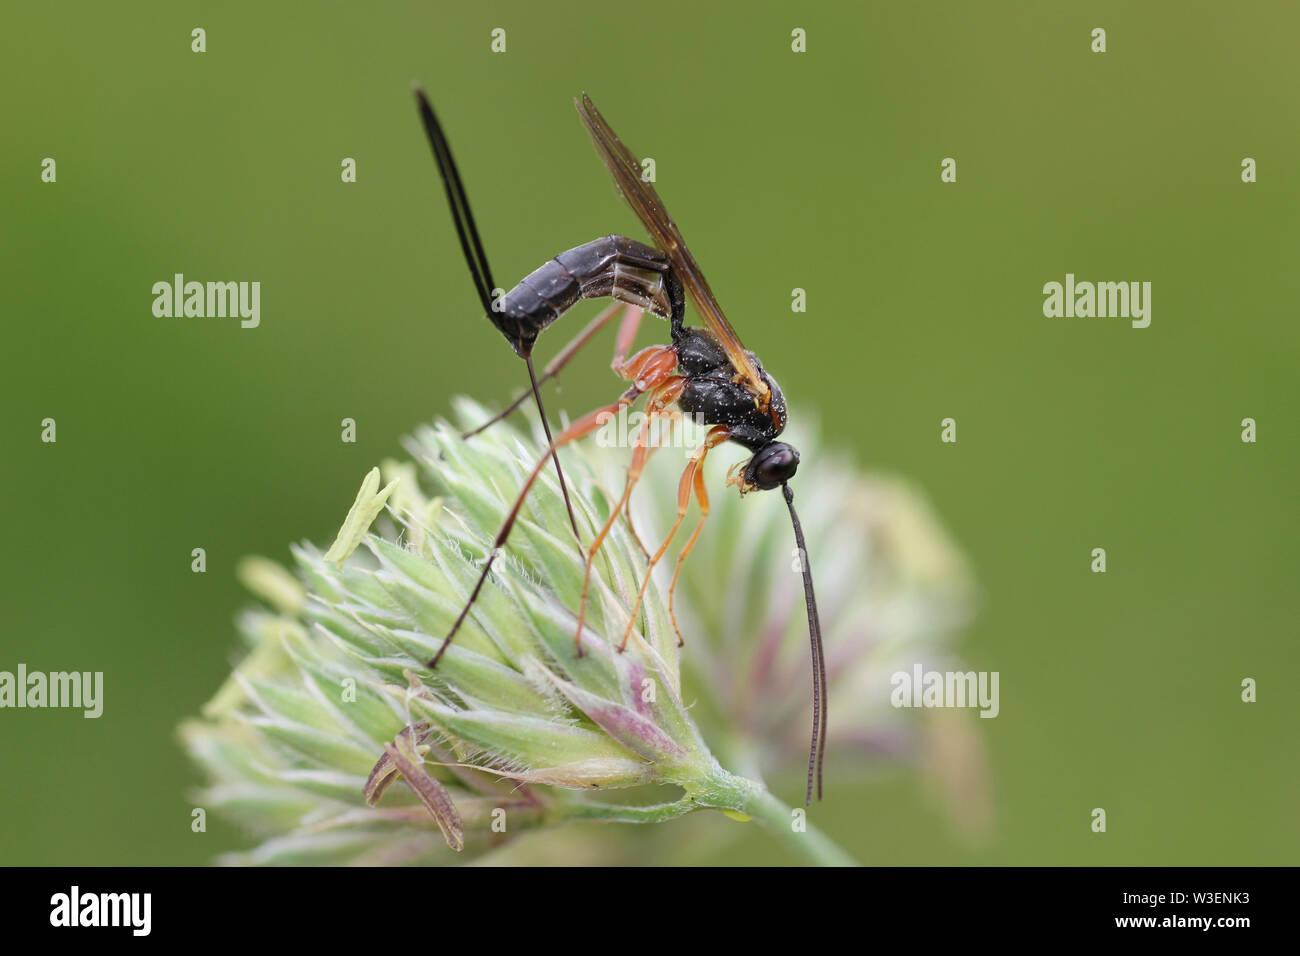 Red-legged Ichneumon Wasp a.k.a. False Slip Wasp Buathra laborator female - Stock Image